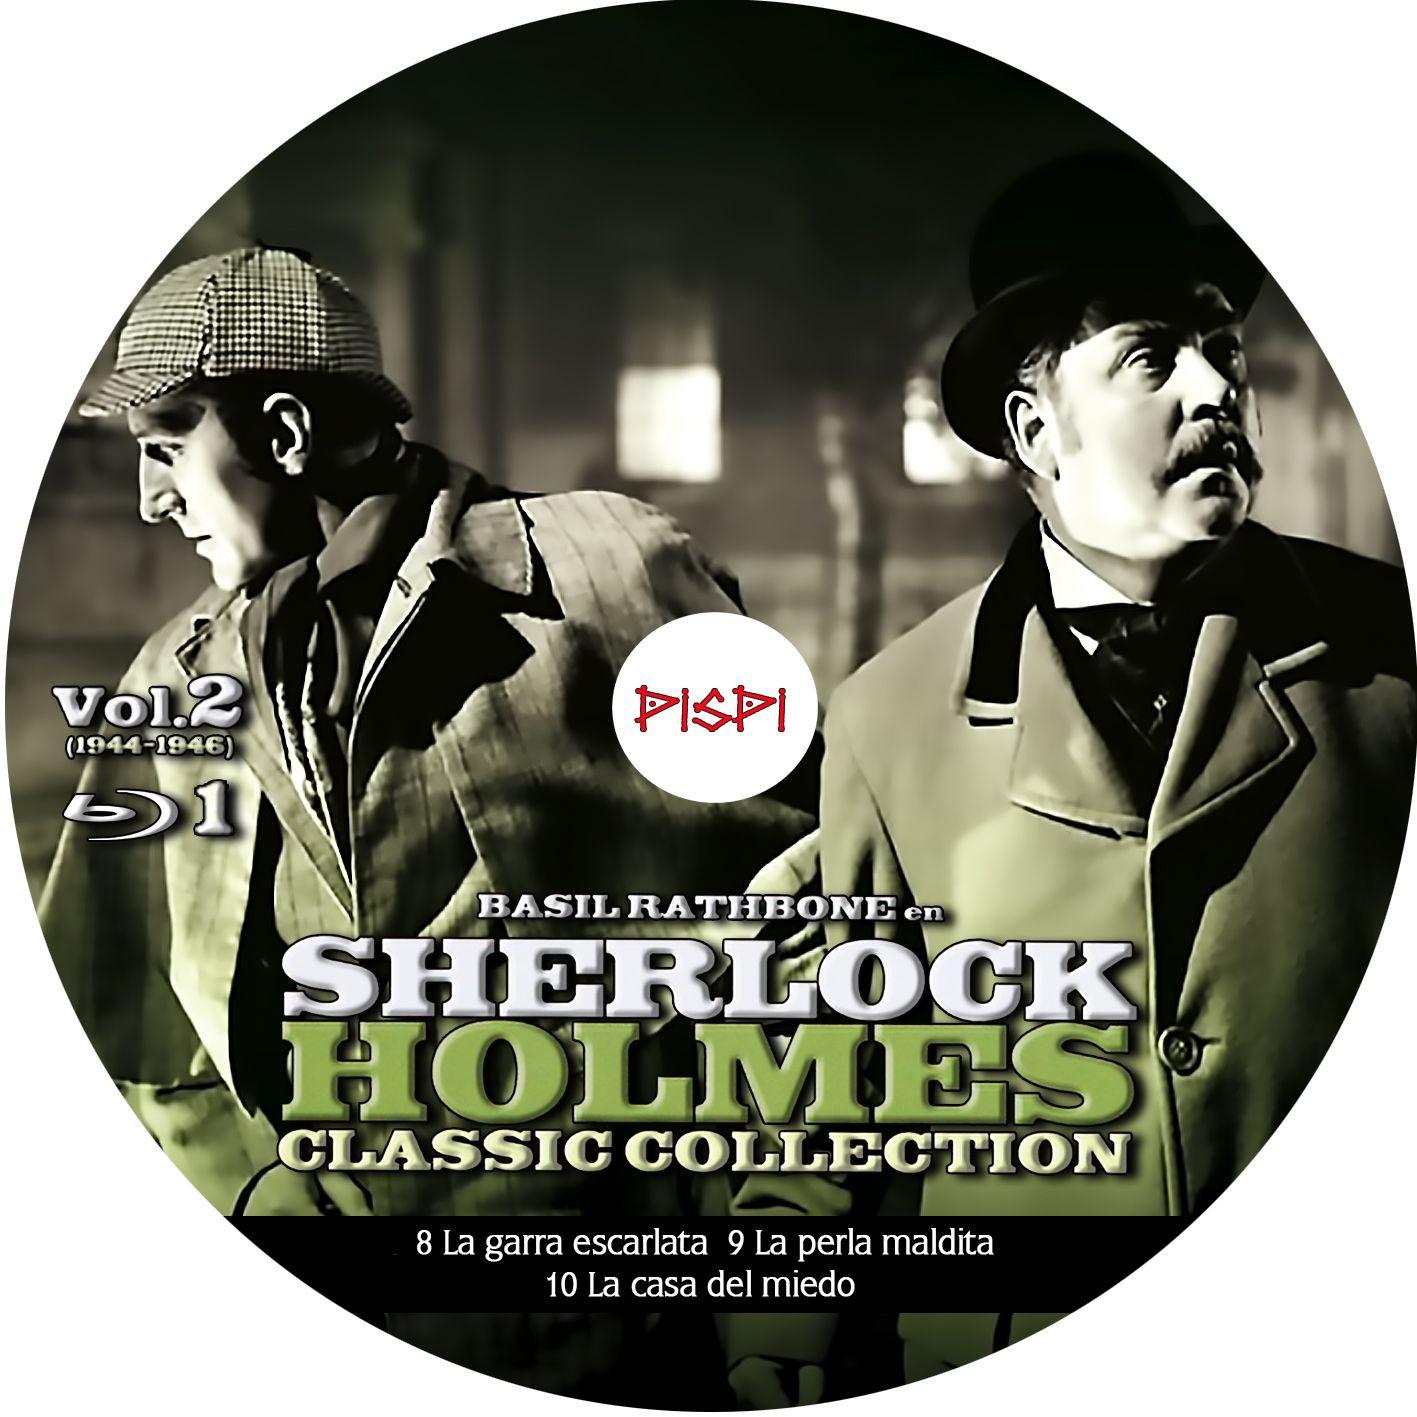 Basil Rathbone En Sherlock Holmes Colección Clásica Vol2 1942 1946 Bd1 Sherlock Holmes Sherlock Funny Jokes